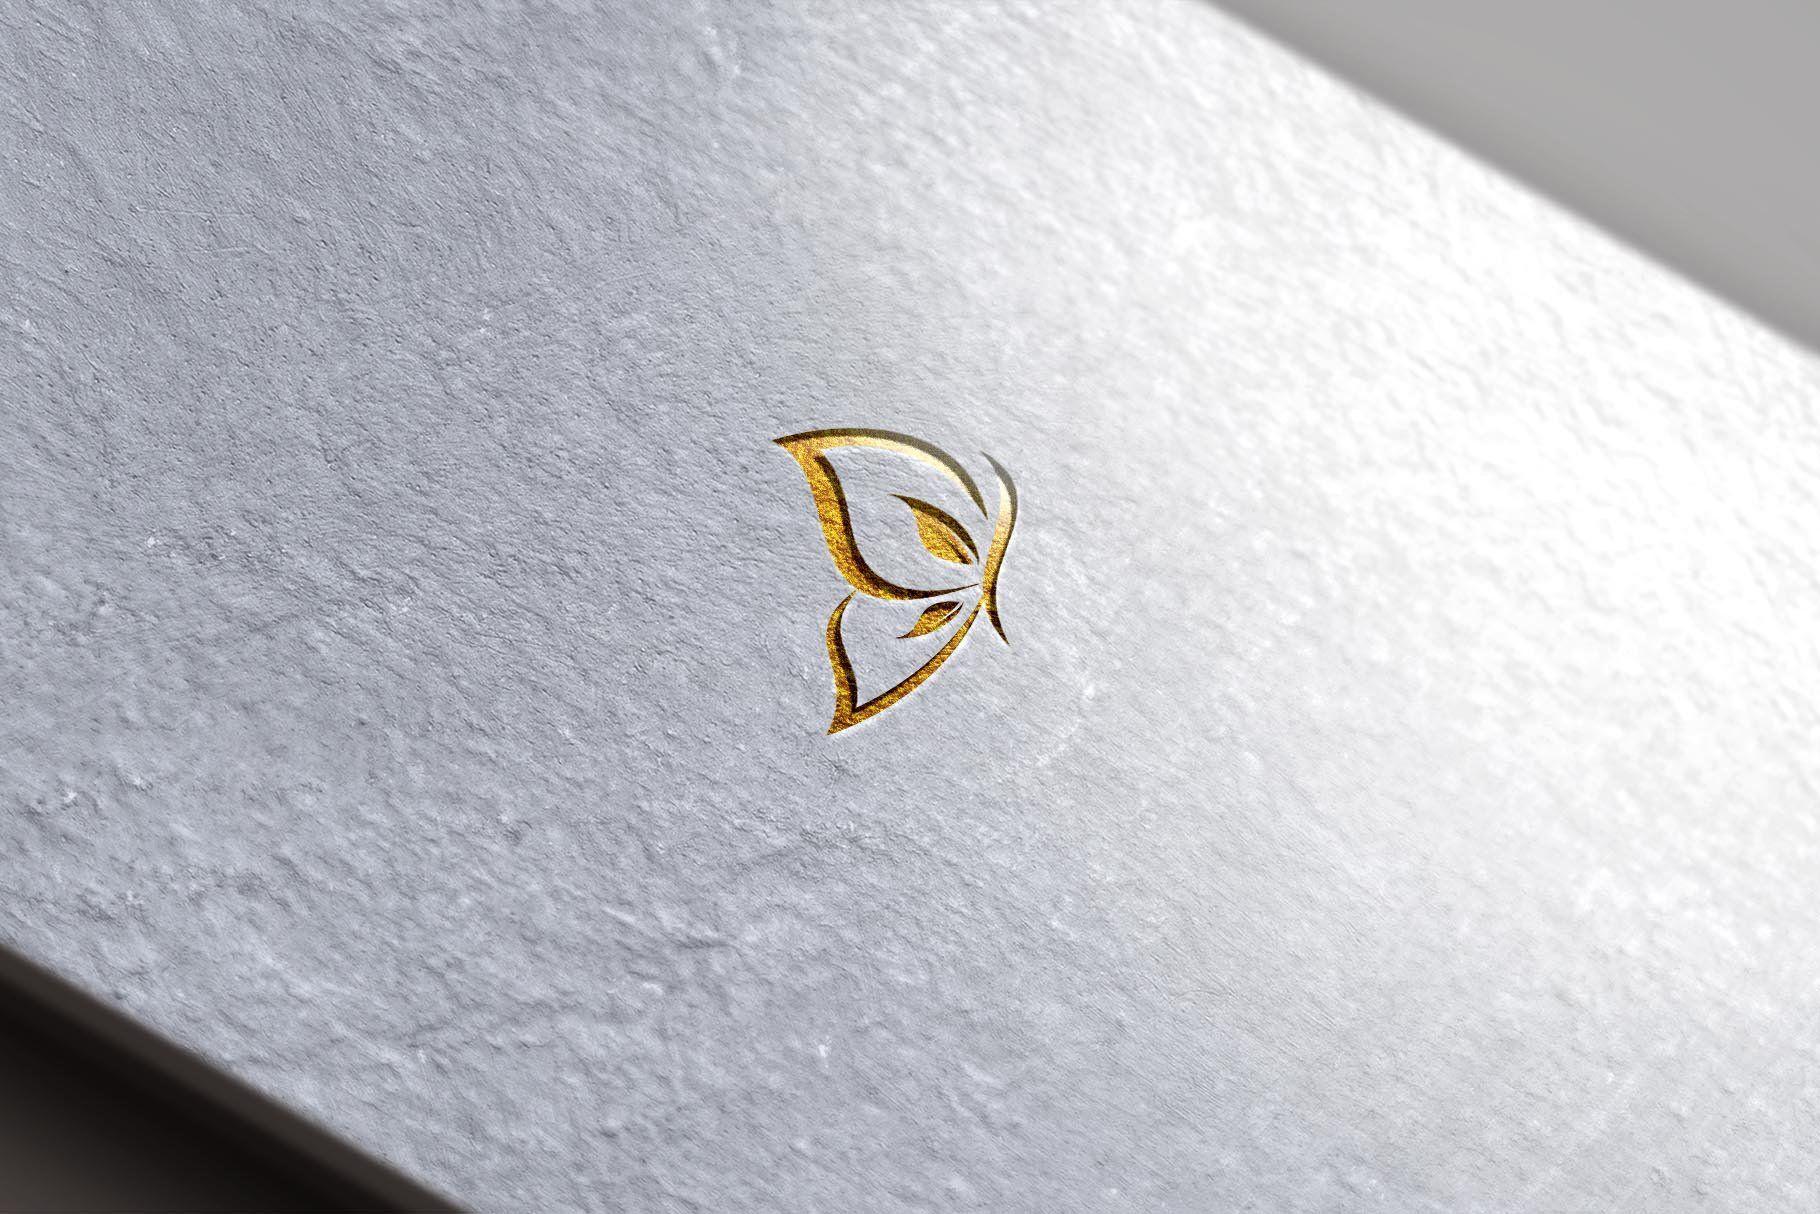 Leaf Butterfly Logo Butterfly logo, Branding design logo